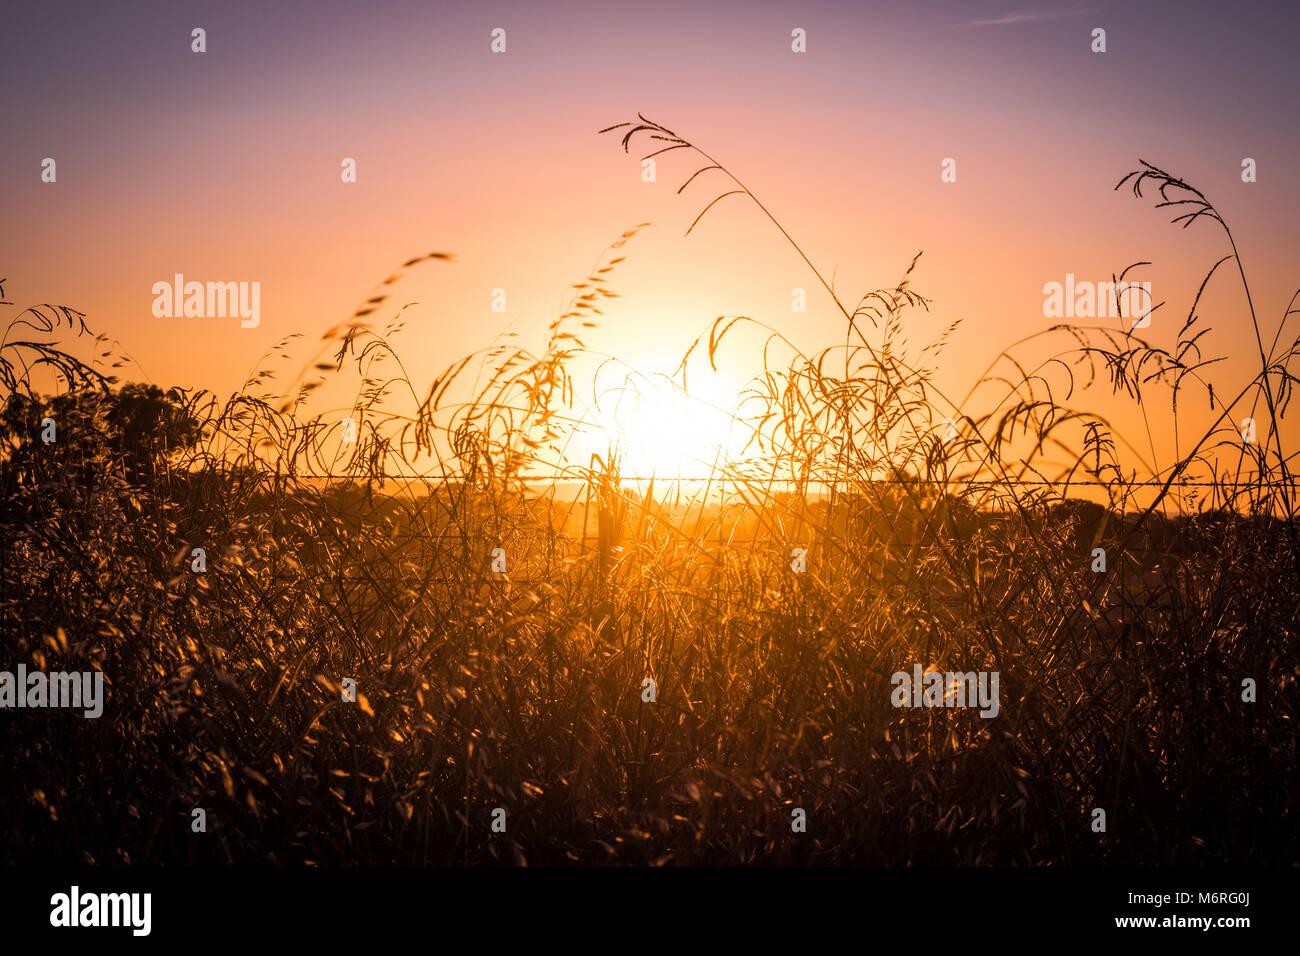 No sunest like home - Stock Image